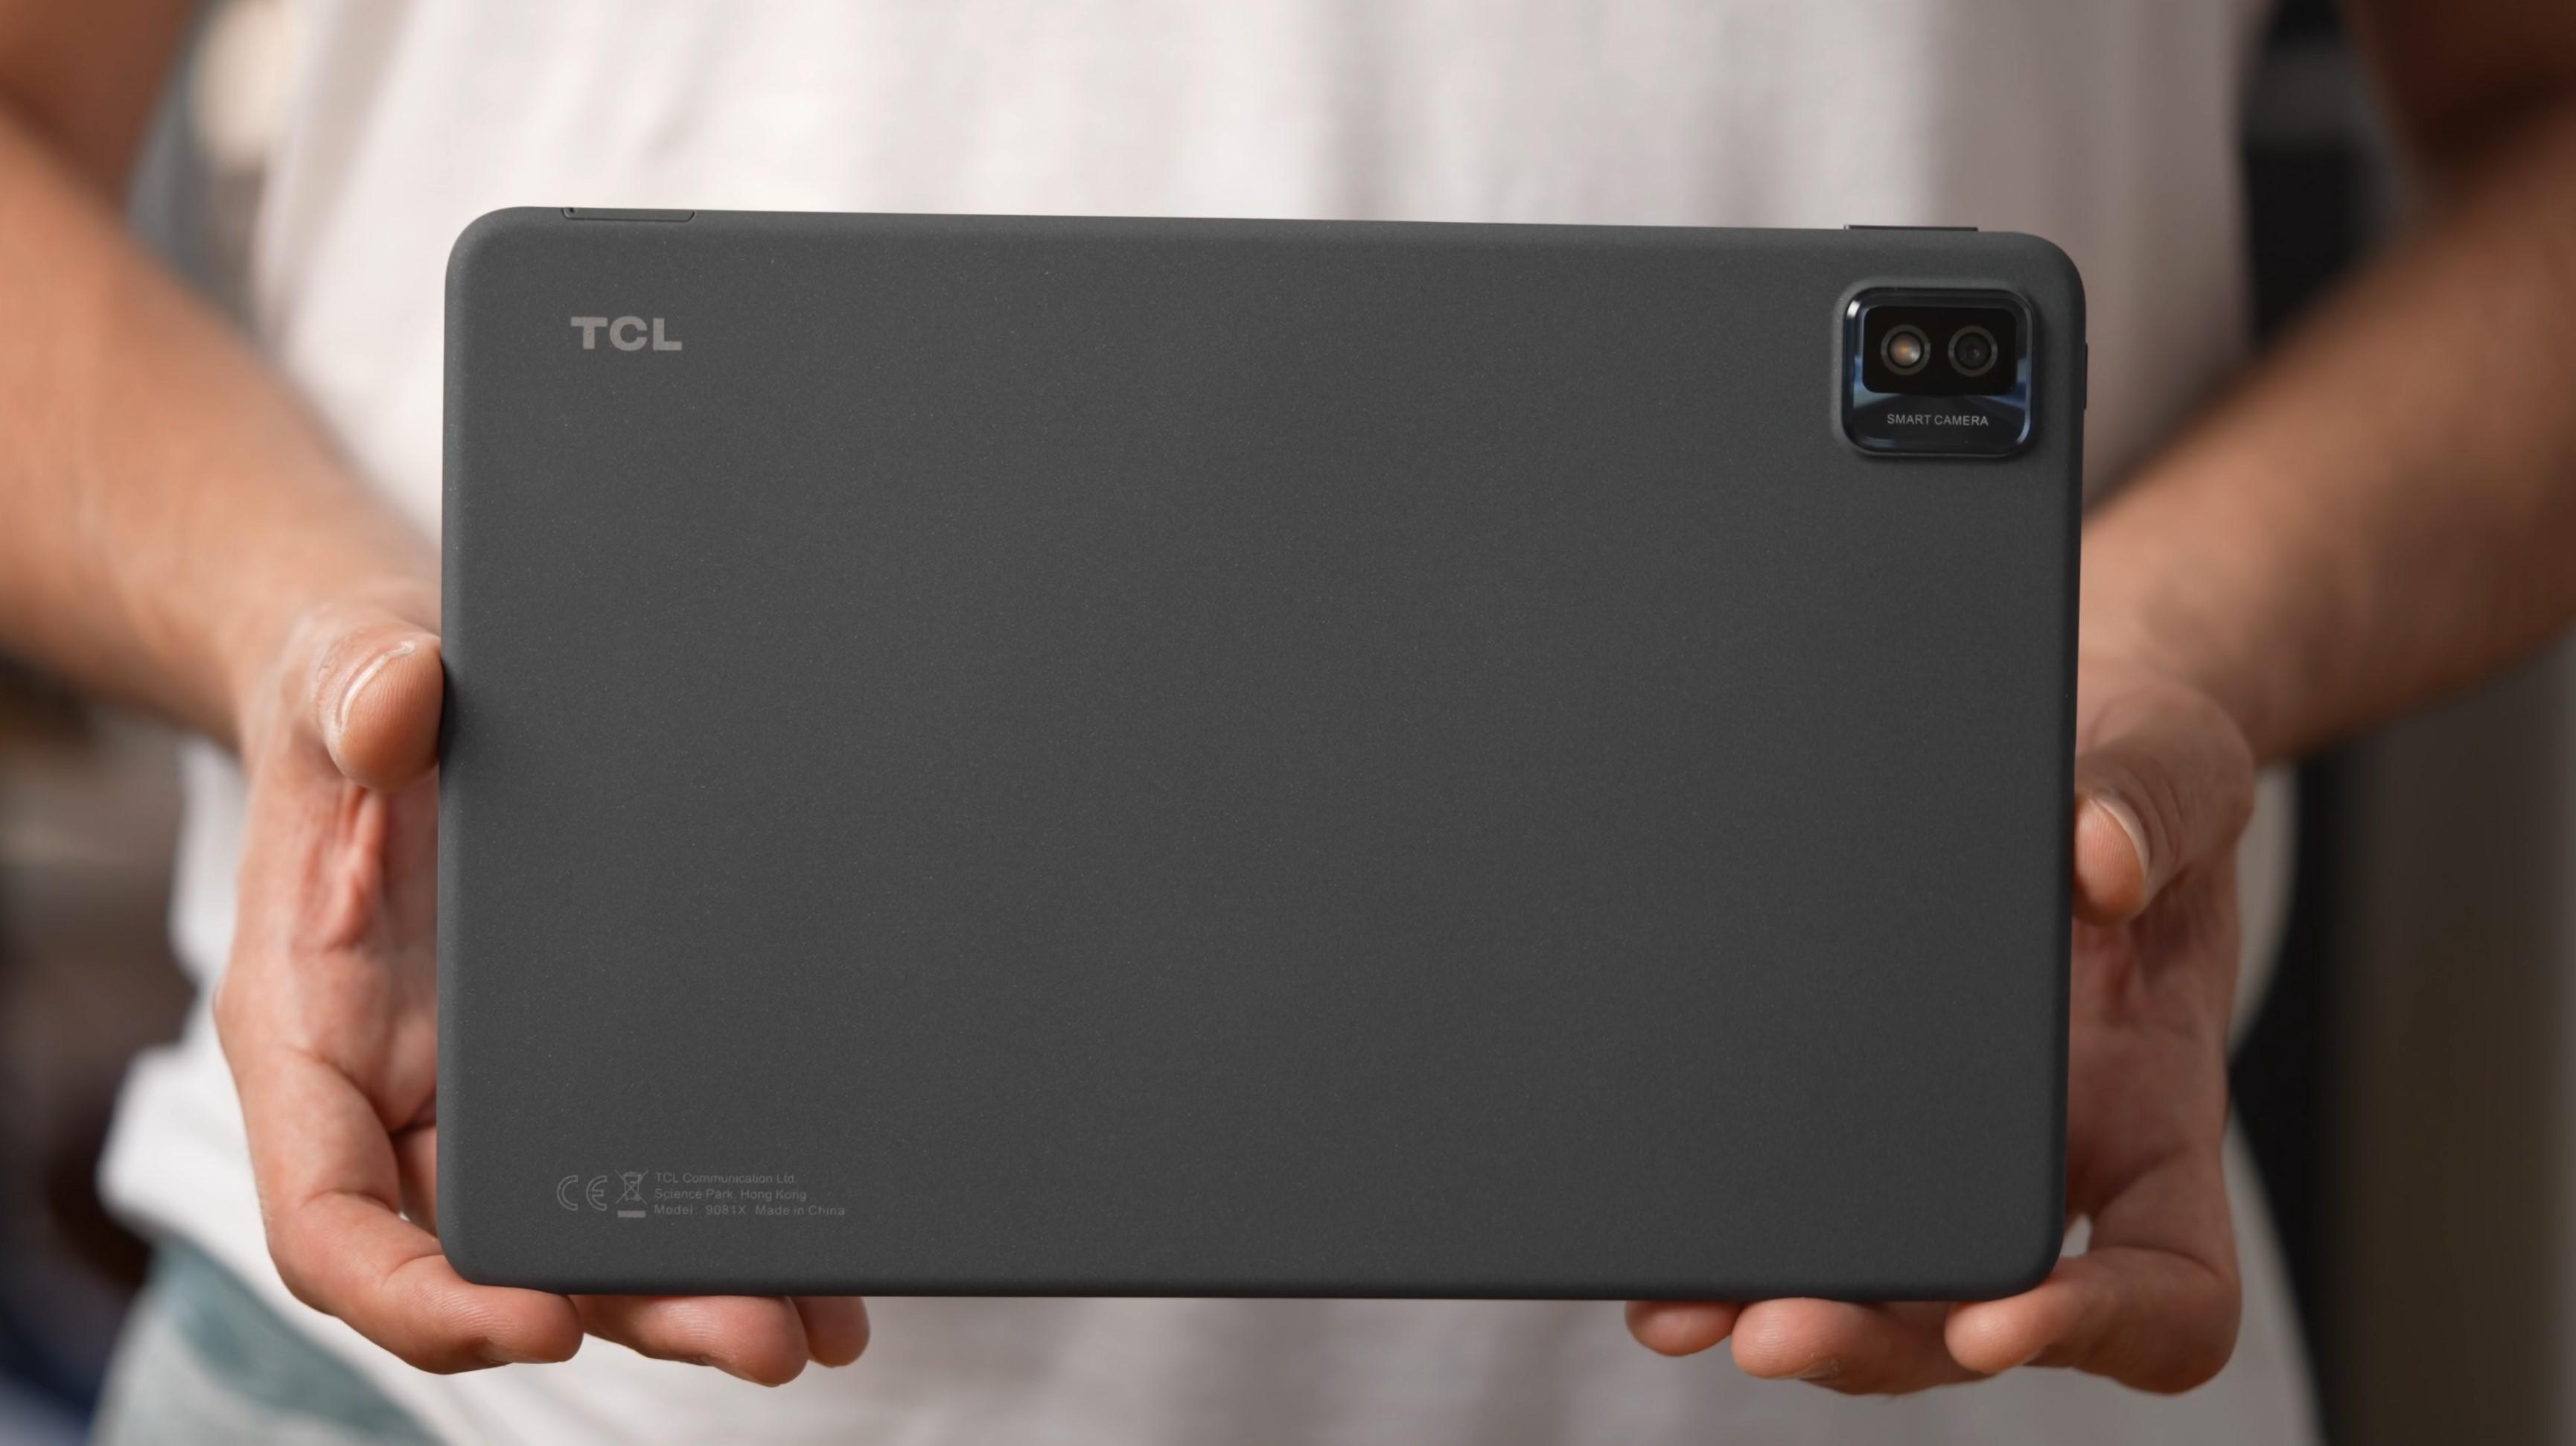 TCL Tab 10s WiFi Vlachakis Techblog